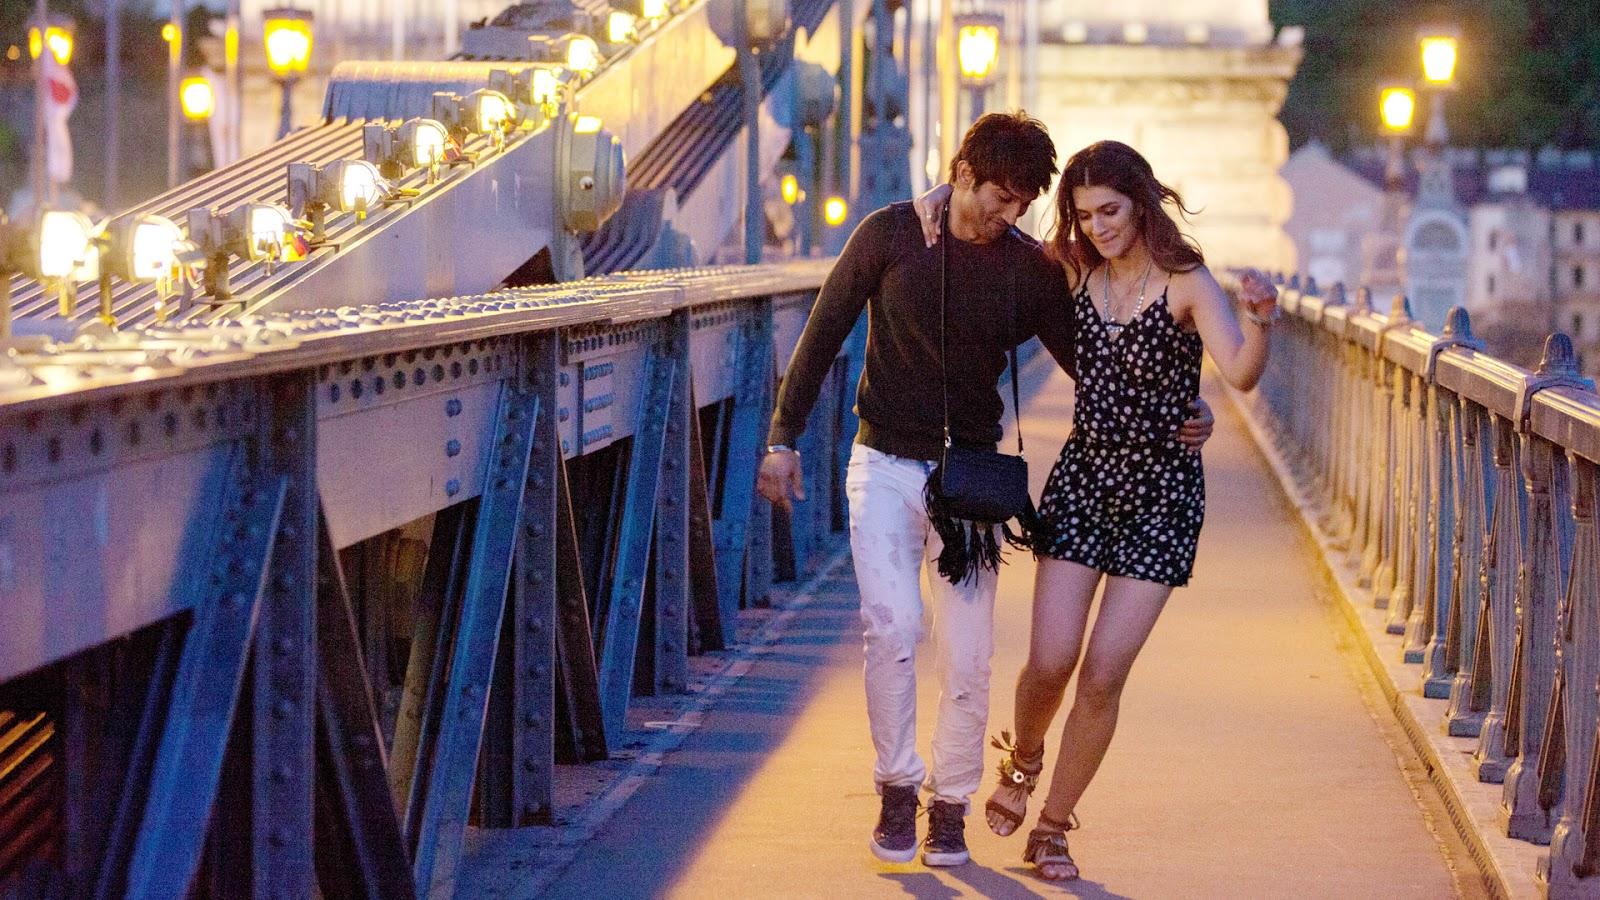 Rajput Wallpaper Hd Download: Raabta Is An Upcoming Indian Movie HD Wallpapers Download